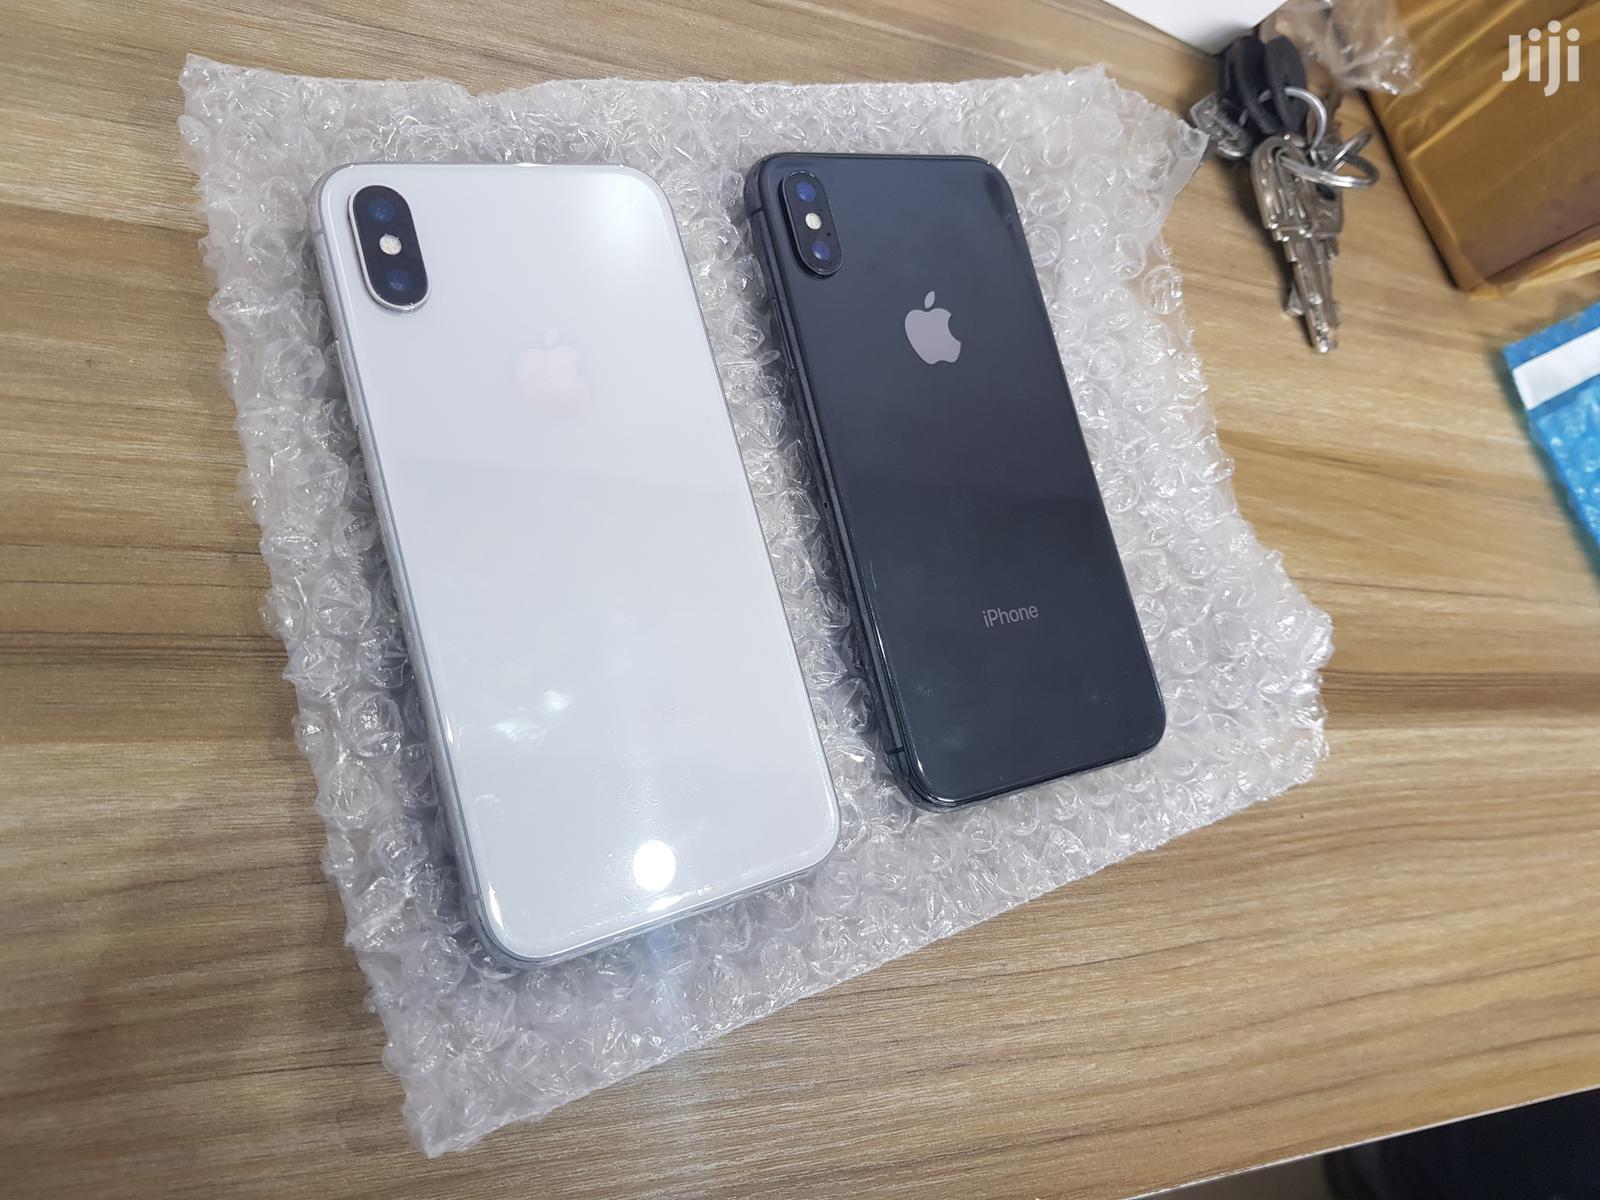 Apple iPhone X 256 GB Black | Mobile Phones for sale in Ibadan, Oyo State, Nigeria